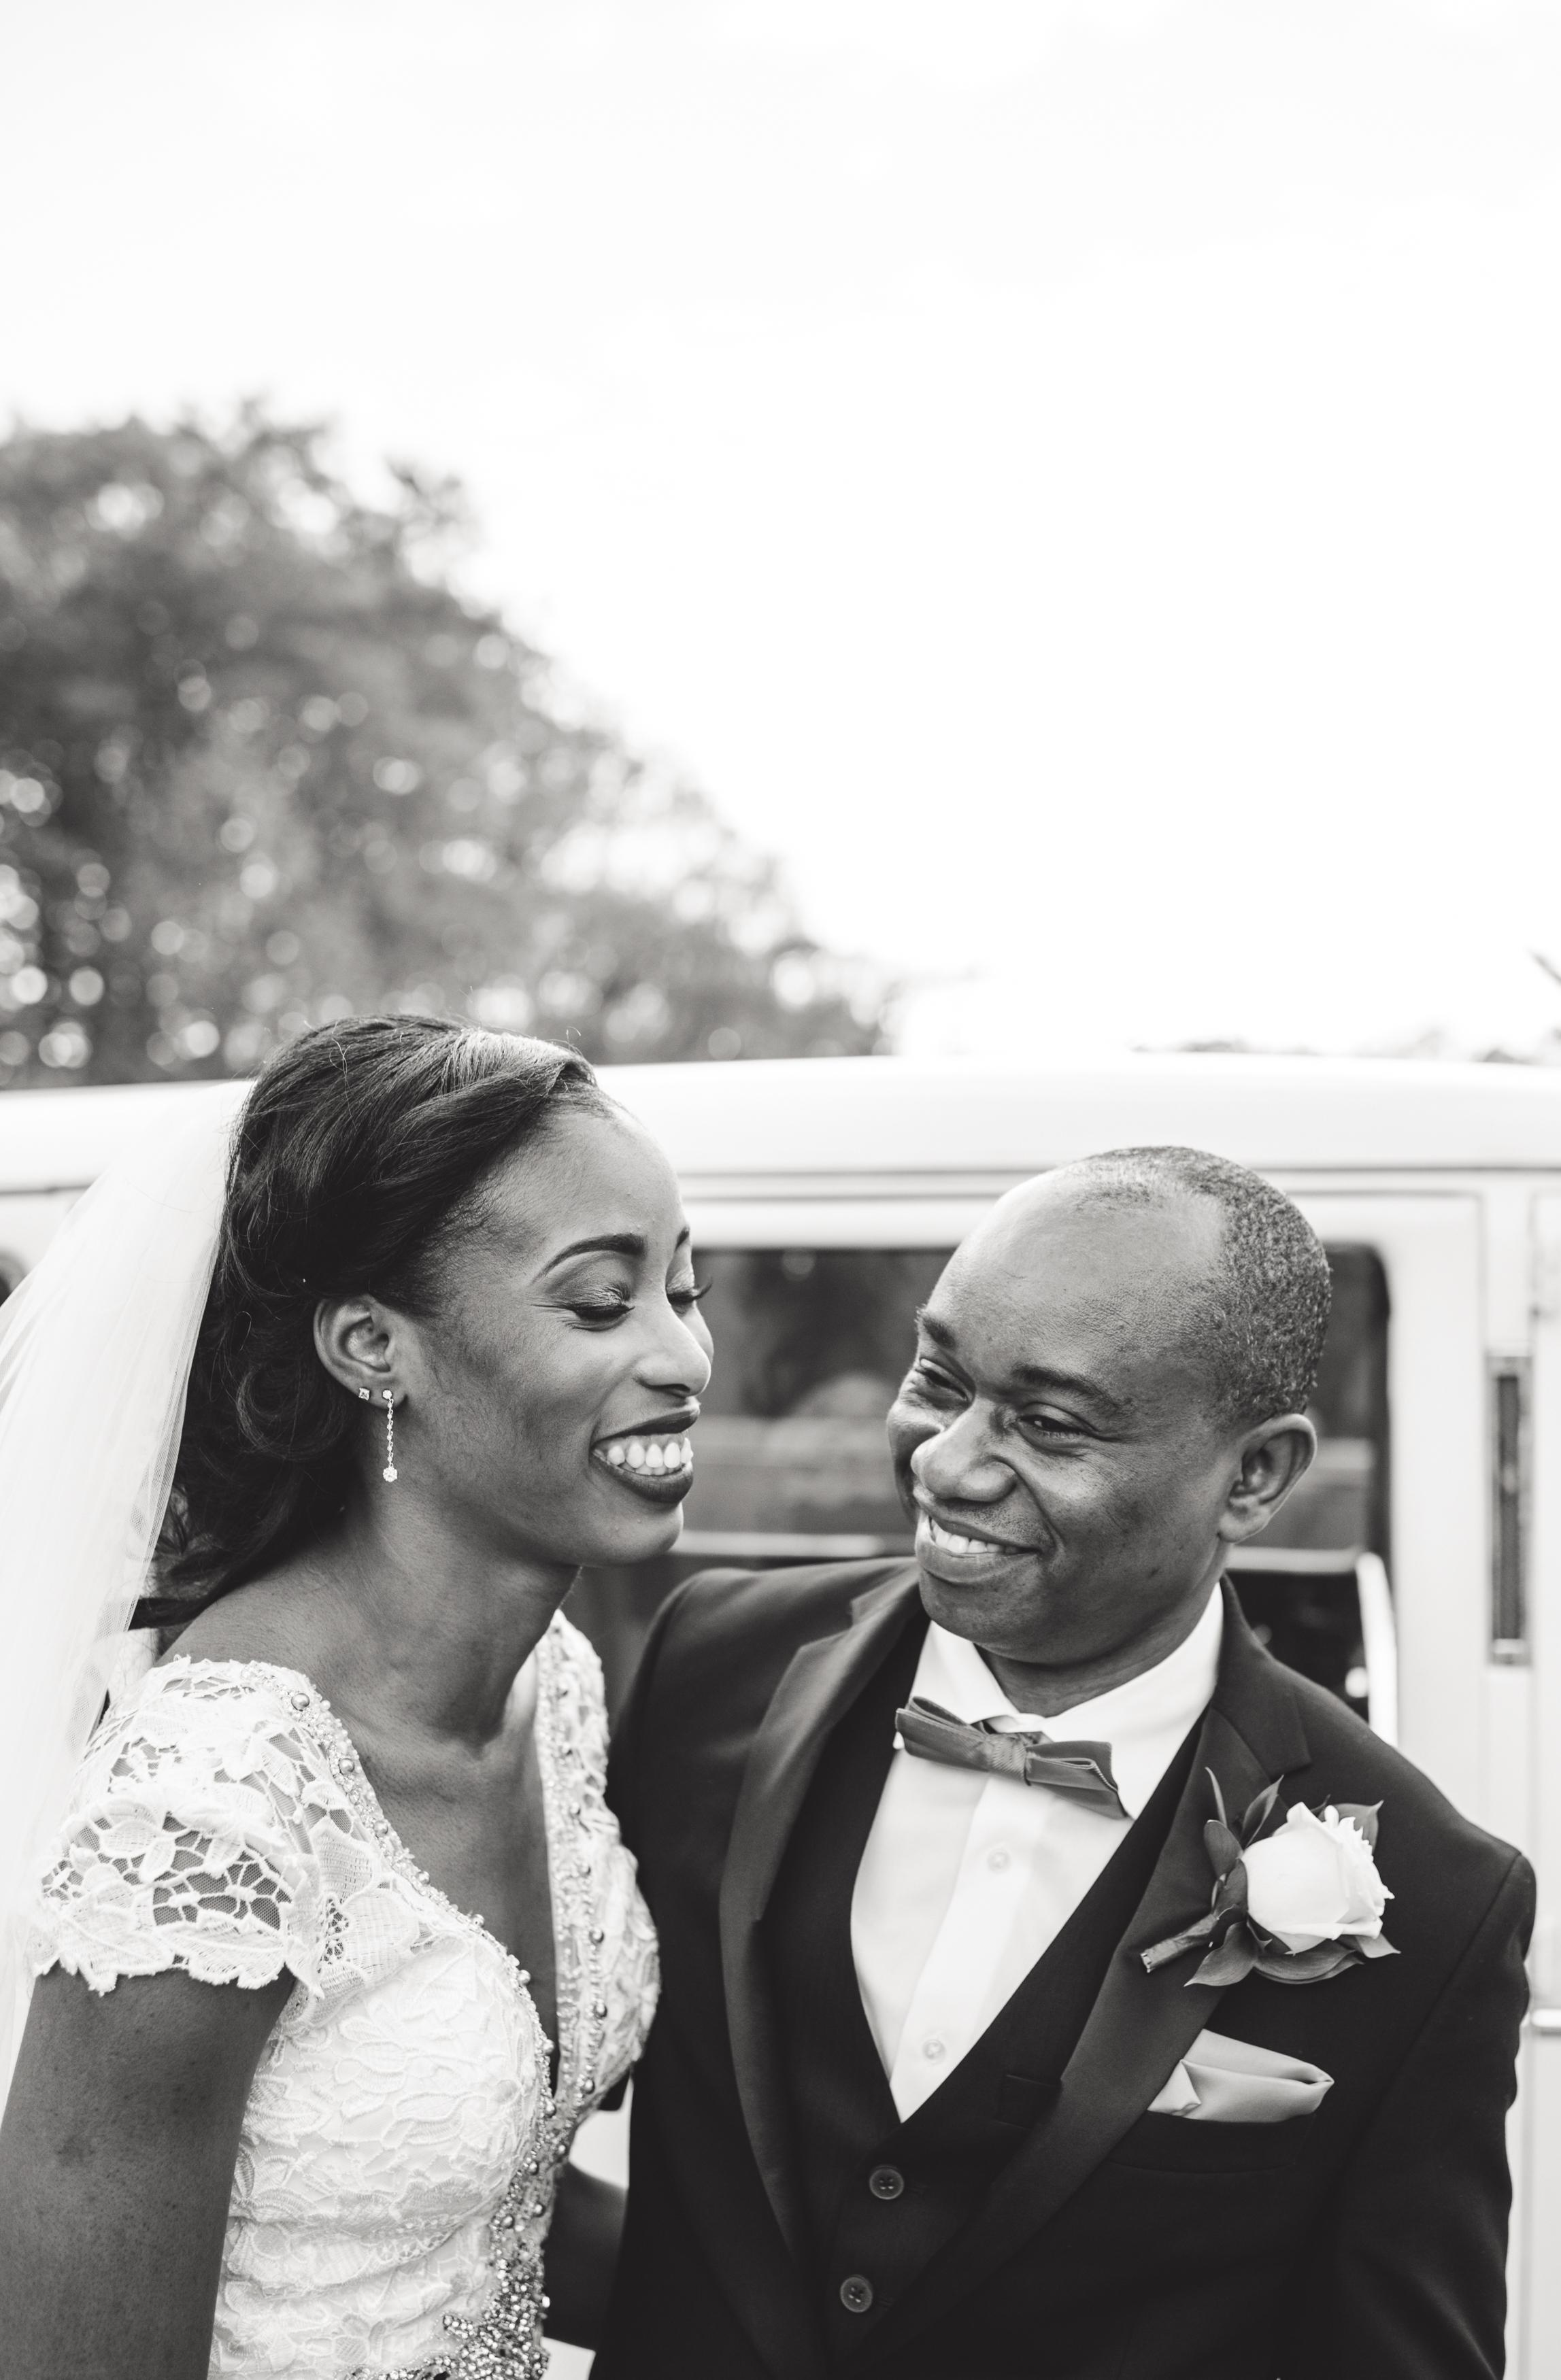 CHIMA & OBIOMA - STATEN ISLAND INTIMATE WEDDING PHOTOGRAPHER - TWOTWENTY by CHI-CHI AGBIM-214.jpg